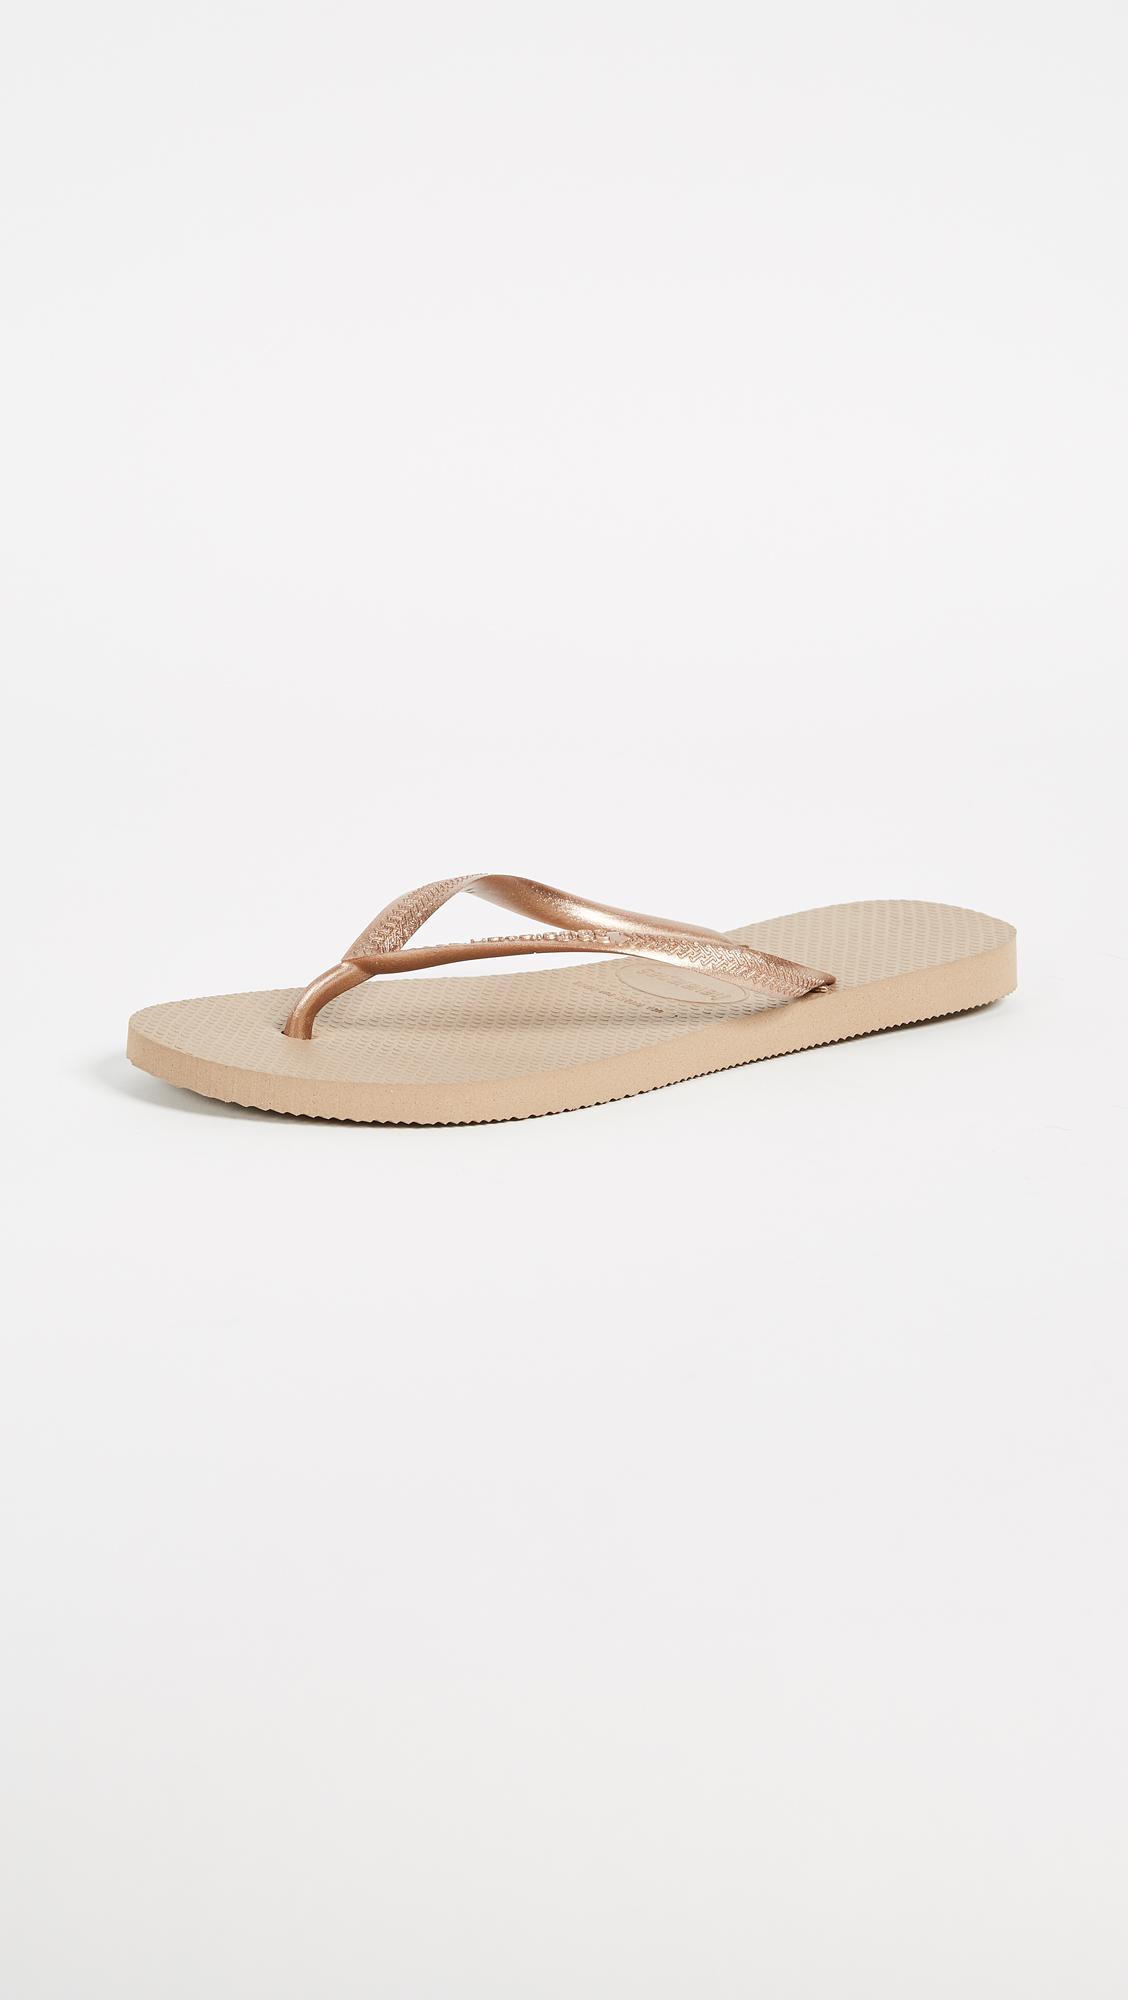 2f0181766187e4 Havaianas Slim Flip Flops - Save 33% - Lyst